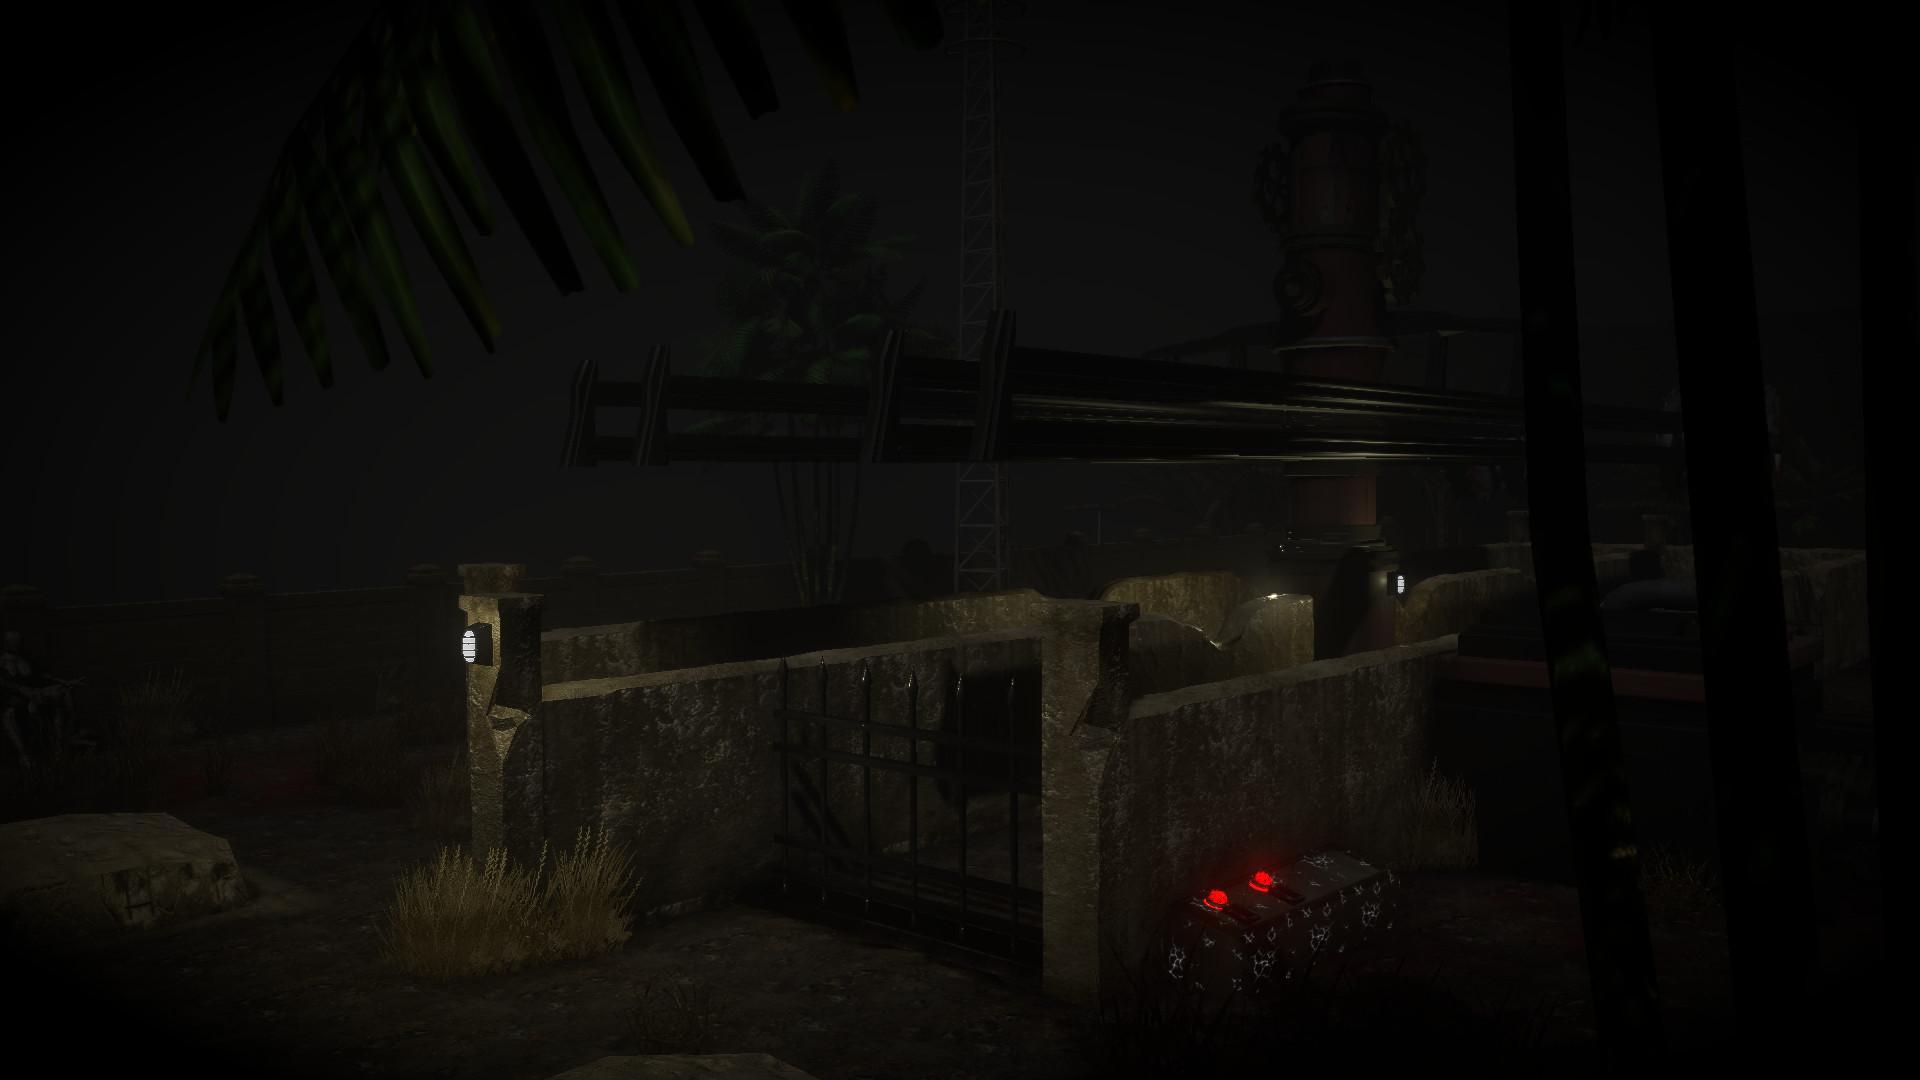 Lithium Inmate 39 Relapsed Edition screenshot